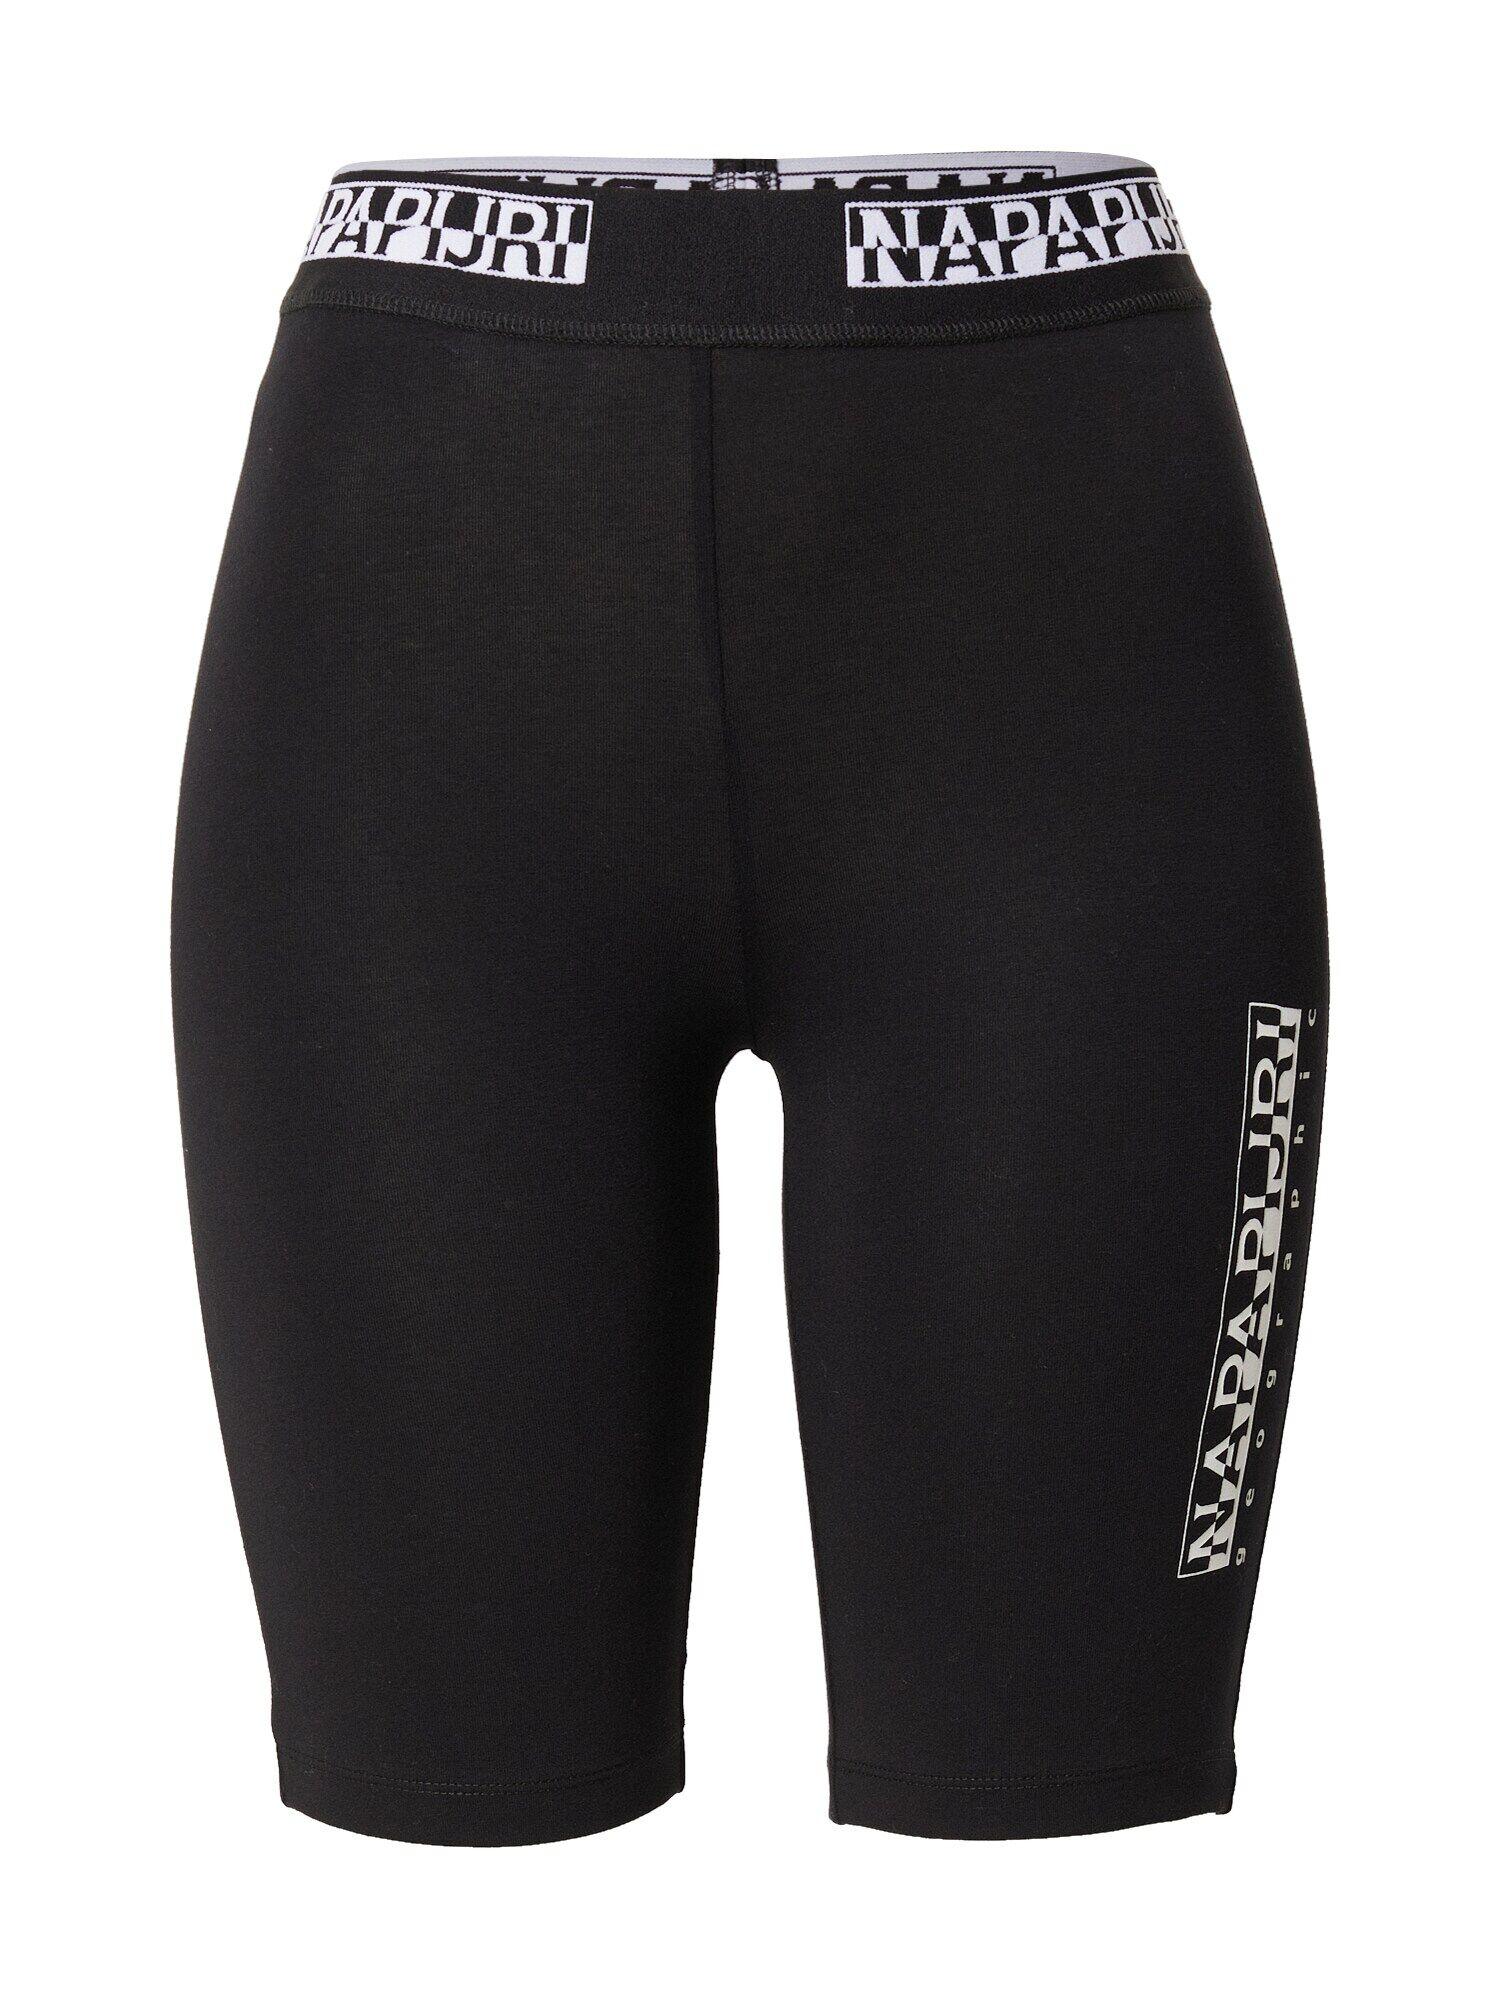 NAPAPIJRI Leggings 'N-BOX'  - Noir - Taille: XS - female